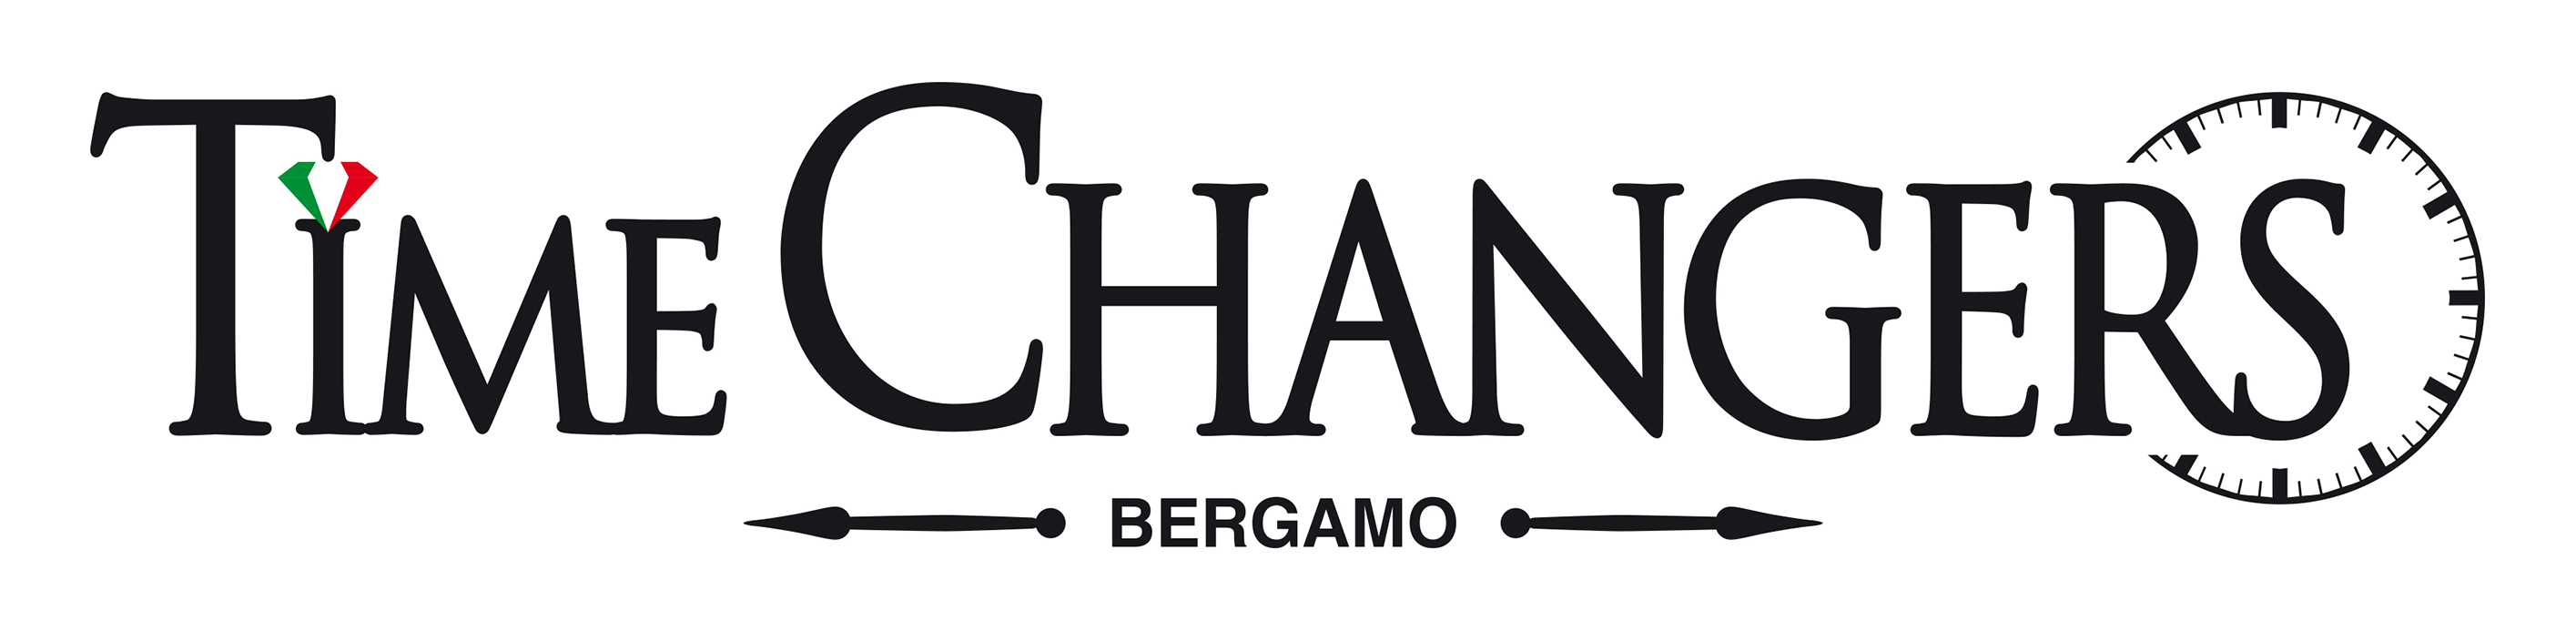 TIME CHANGERS BERGAMO